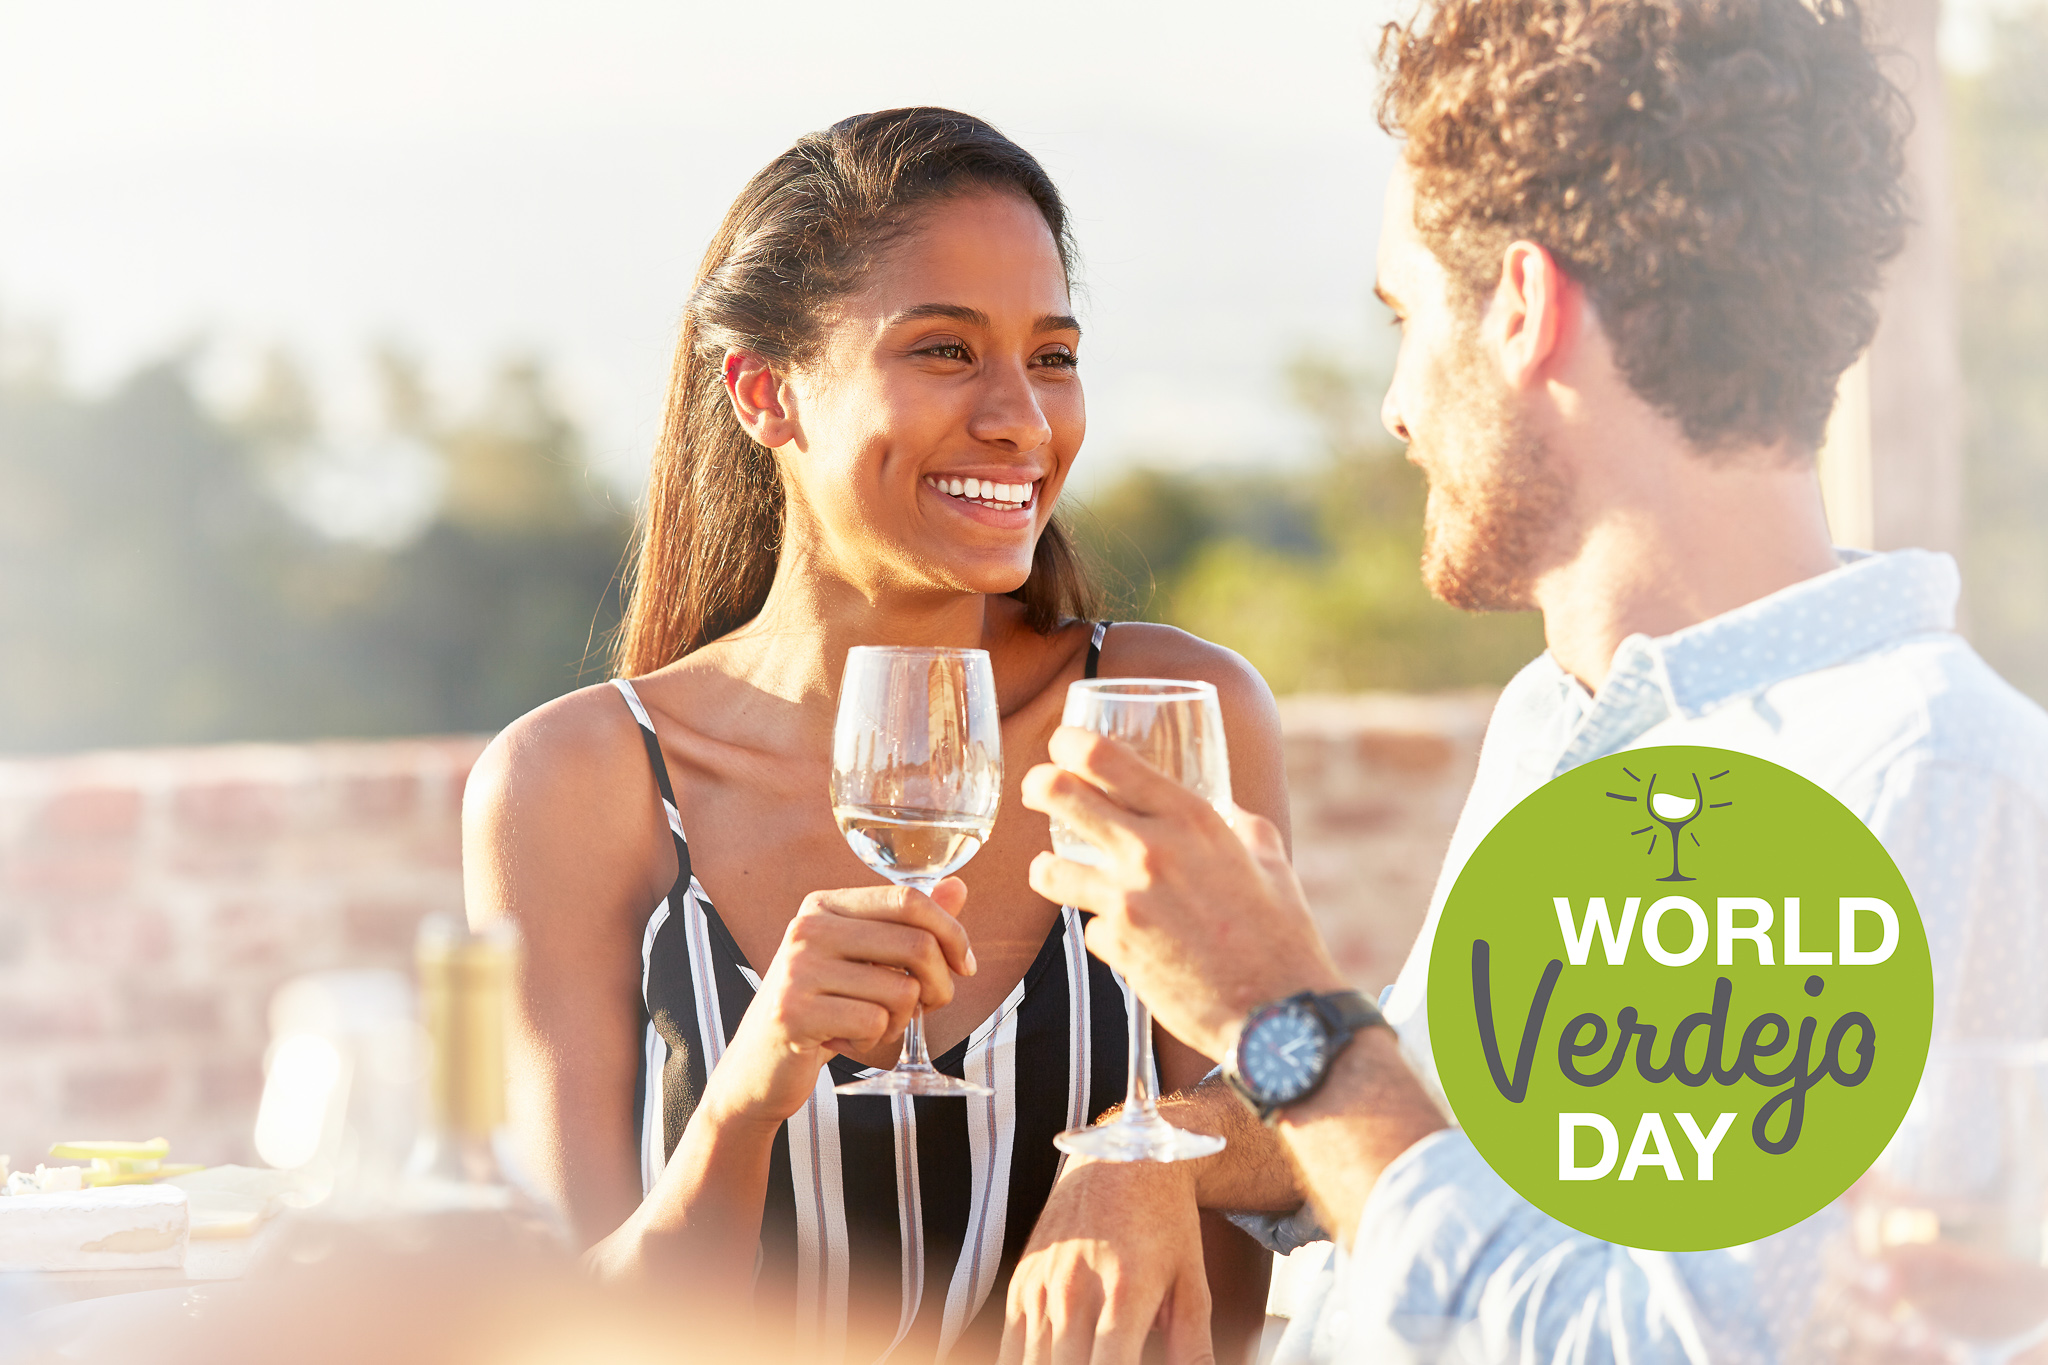 World Verdejo Day 2021